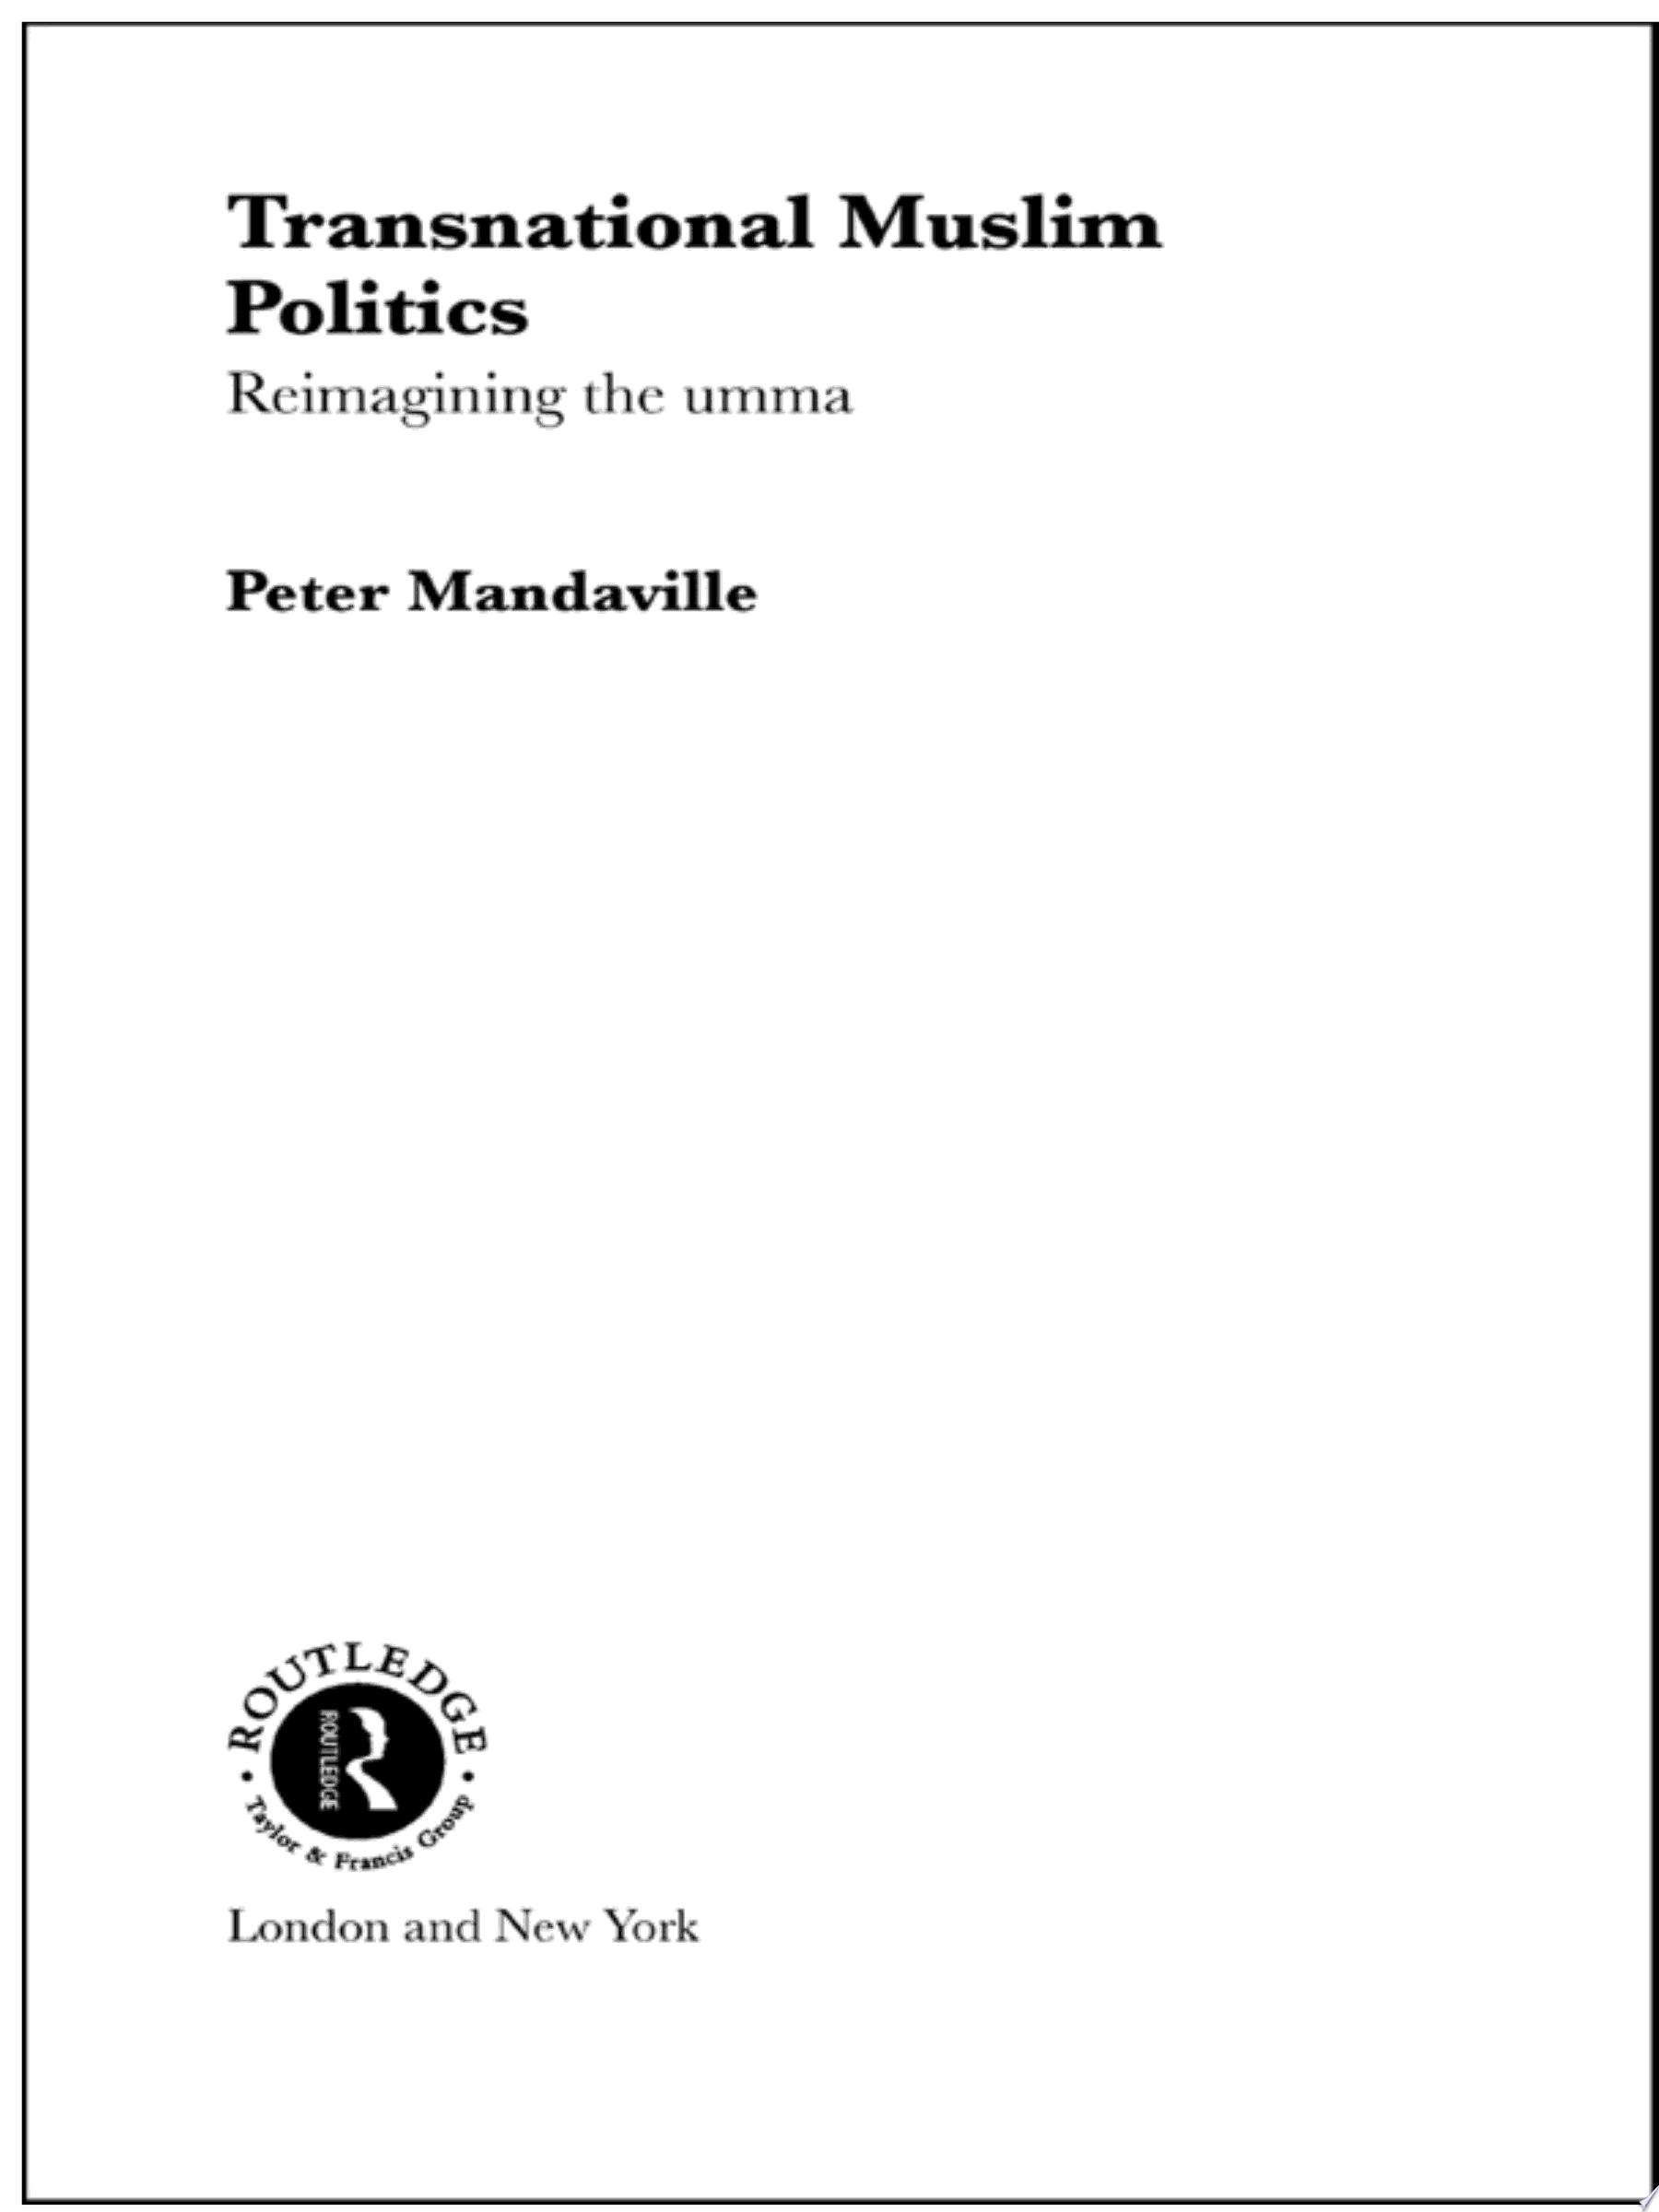 Transnational Muslim Politics